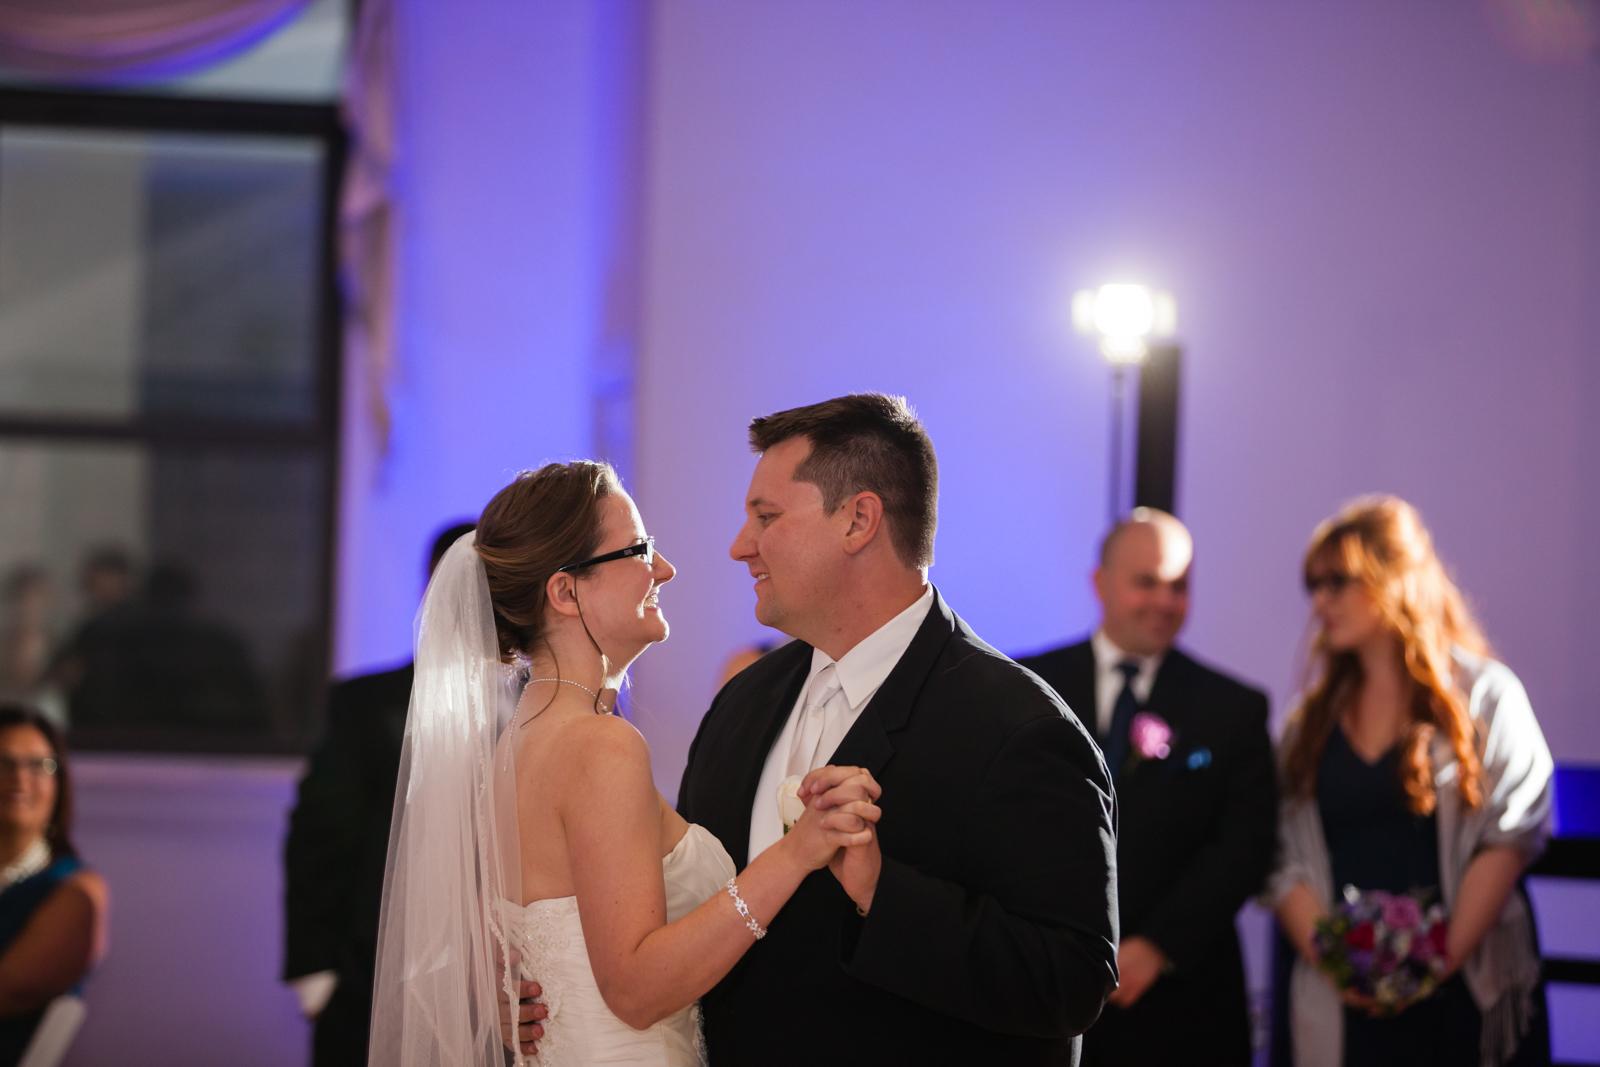 Eastons-Beach-Rotunda-Ballroom-Wedding-Newport-Rhode-Island-PhotographybyAmandaMorgan-102.jpg